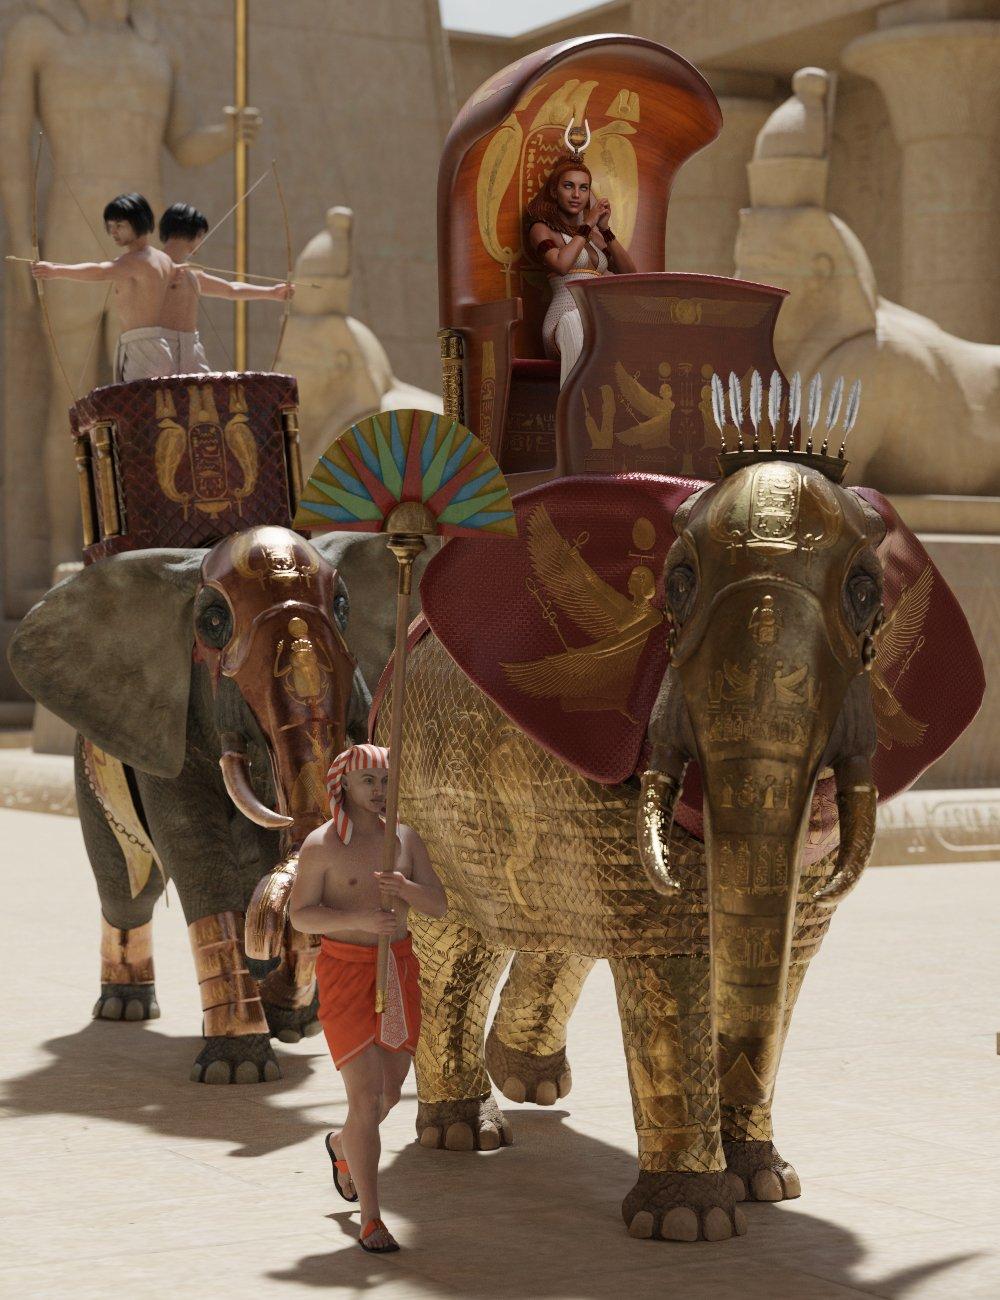 Egyptian Elephant Warrior for African Elephant by: Deepsea, 3D Models by Daz 3D